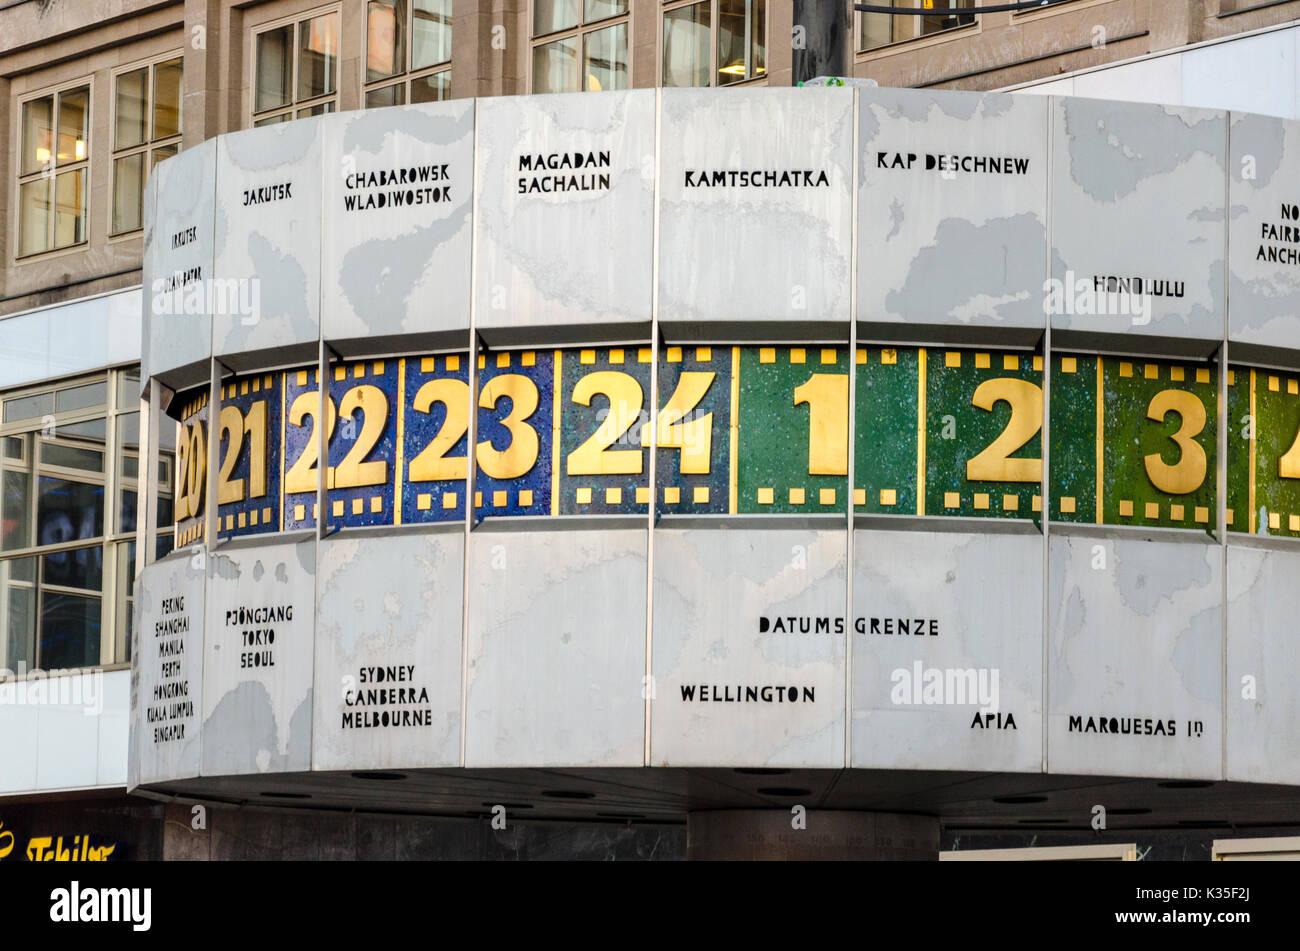 Detail of World Time Clock, Urania-Weltzeituhr, Alexanderplatz, Berlin, Germany Stock Photo